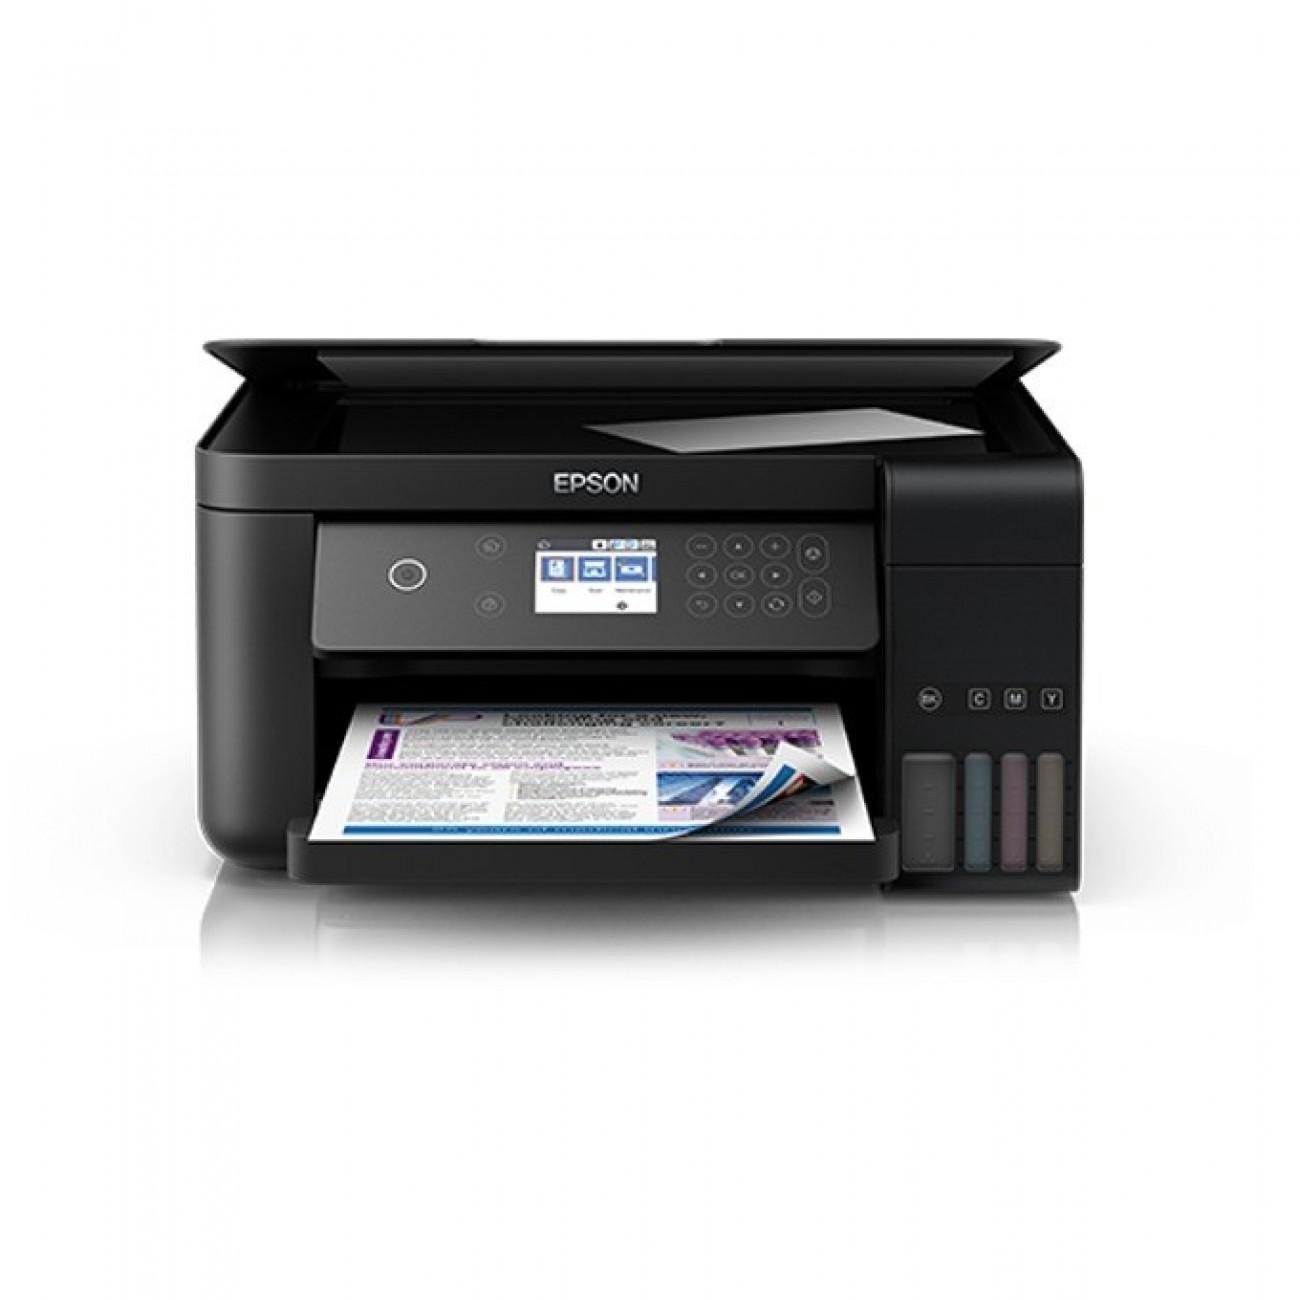 Мултифункционално мастиленоструйно устройство Epson L6160, цветен принтер/копир/скенер, 4800 x 1200 dpi, 15 стр/мин, USB, LAN, Wi-Fi, A4 в Мултифункционали и MFP -  | Alleop